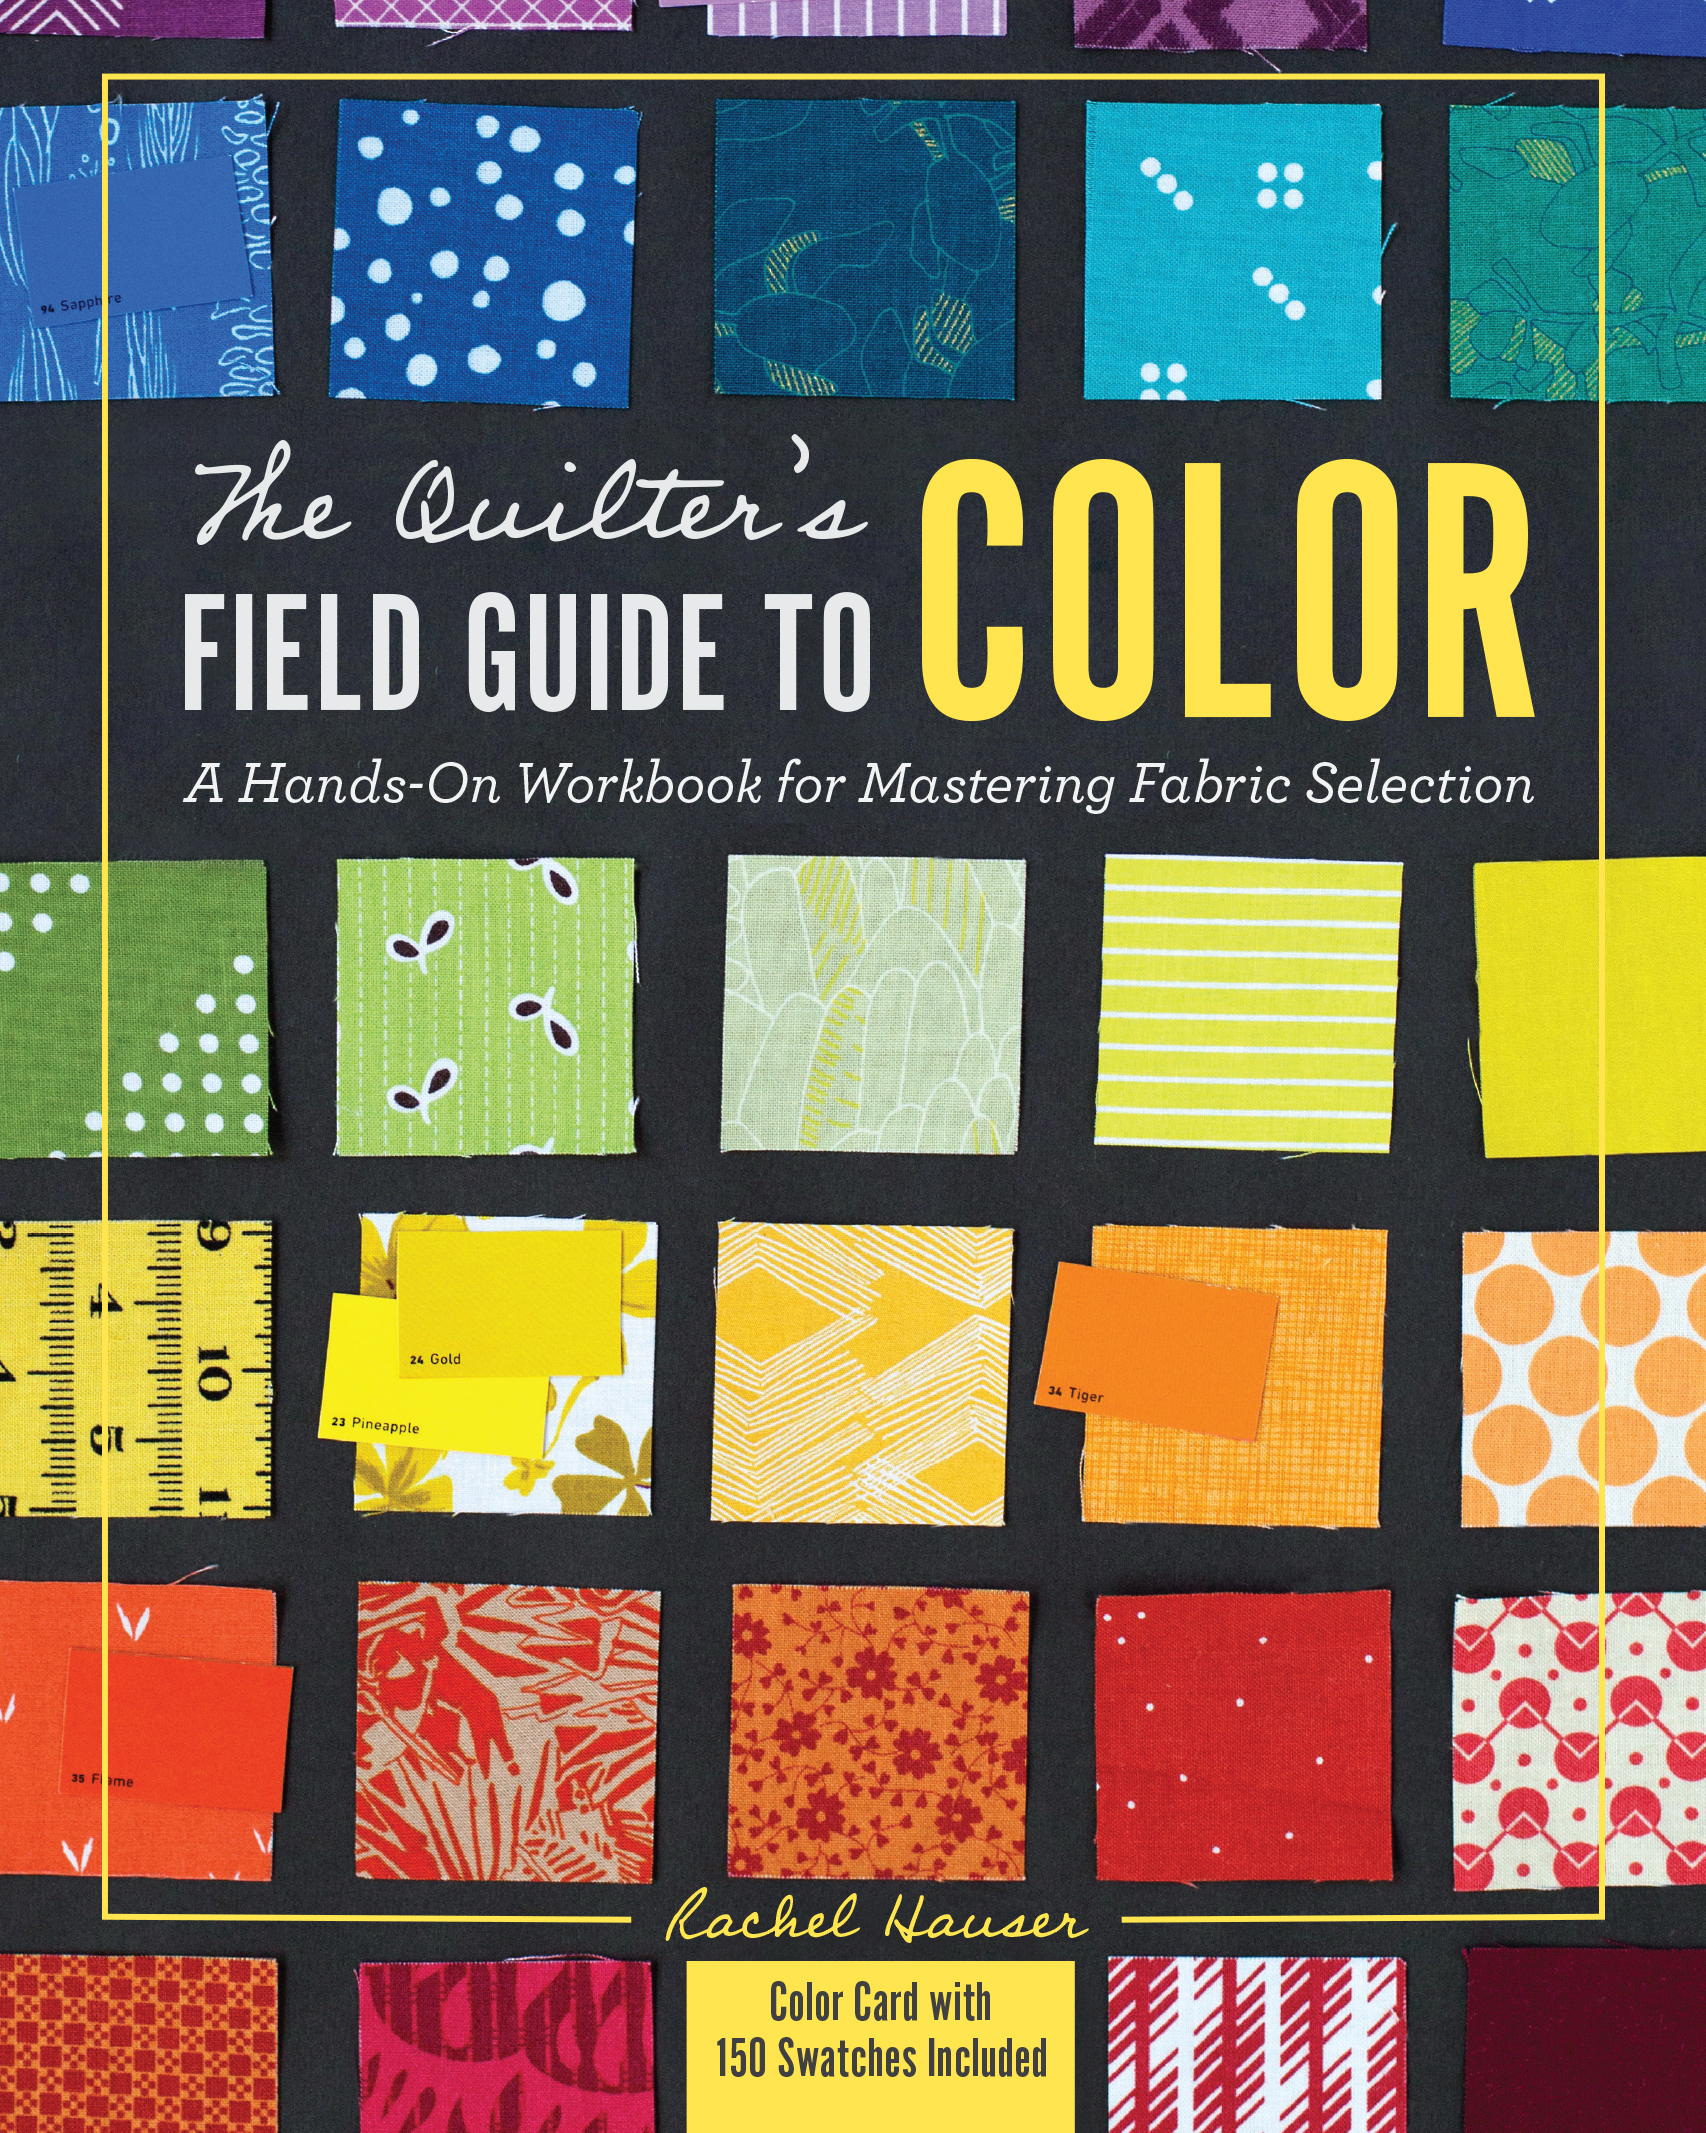 Field Guide cover.jpg